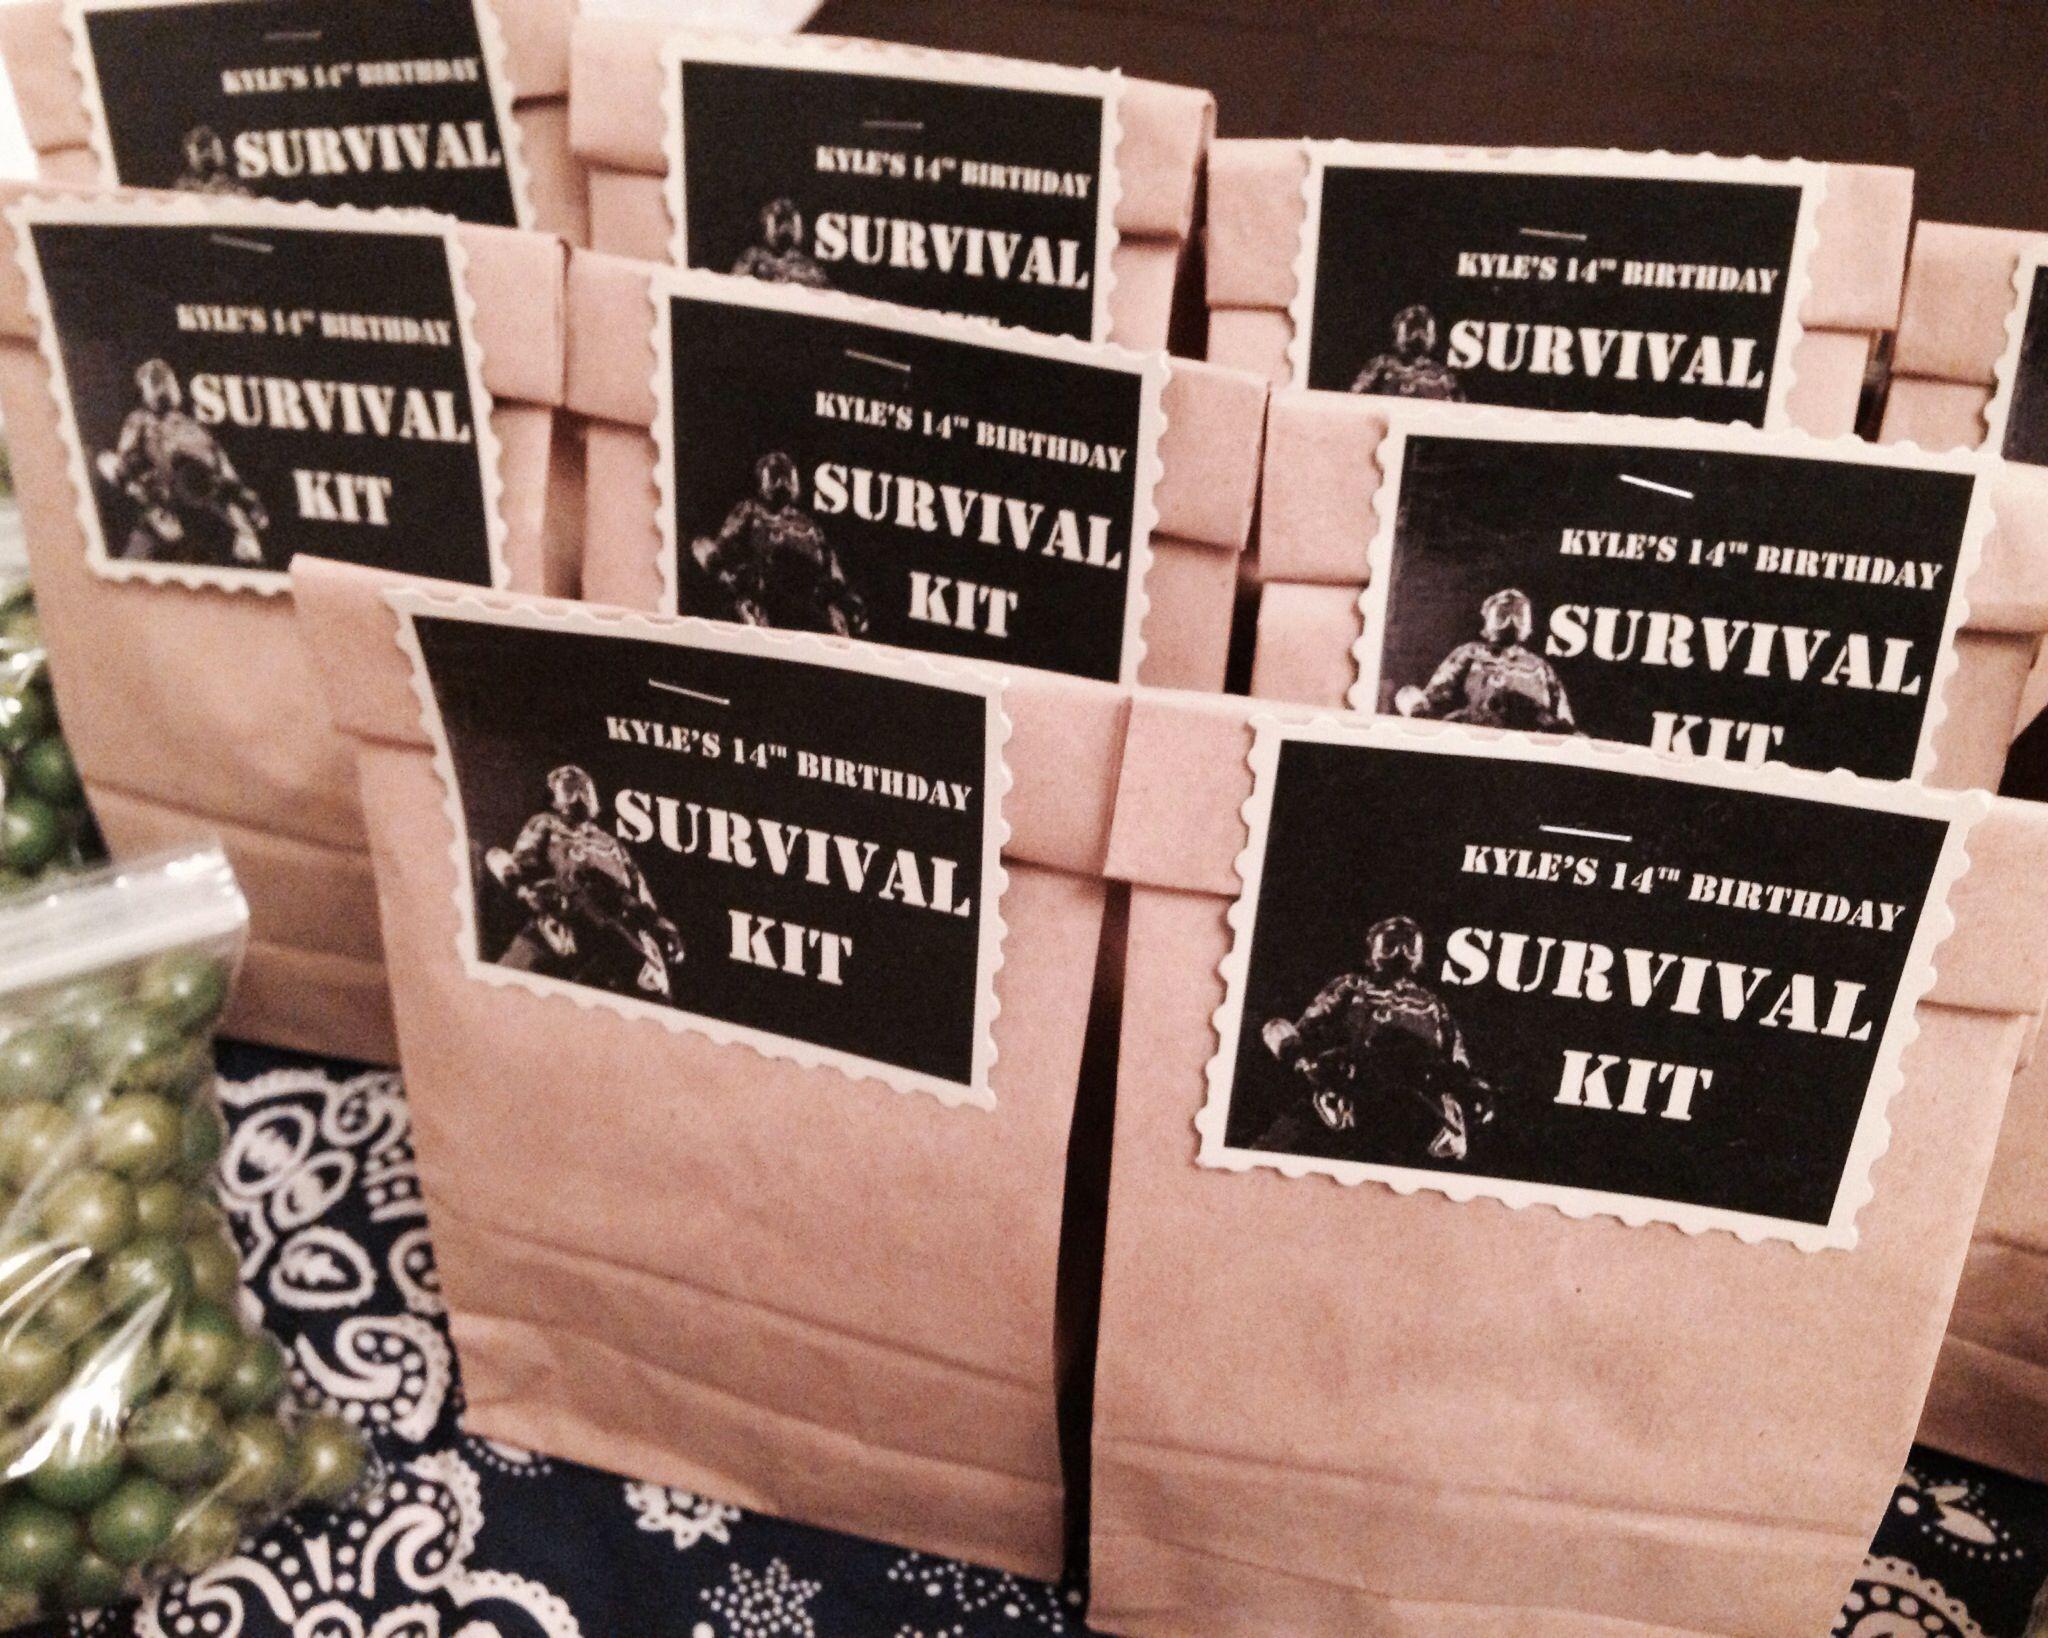 Kyles 14th bday paintball party goody bag AKA survival kit Treat